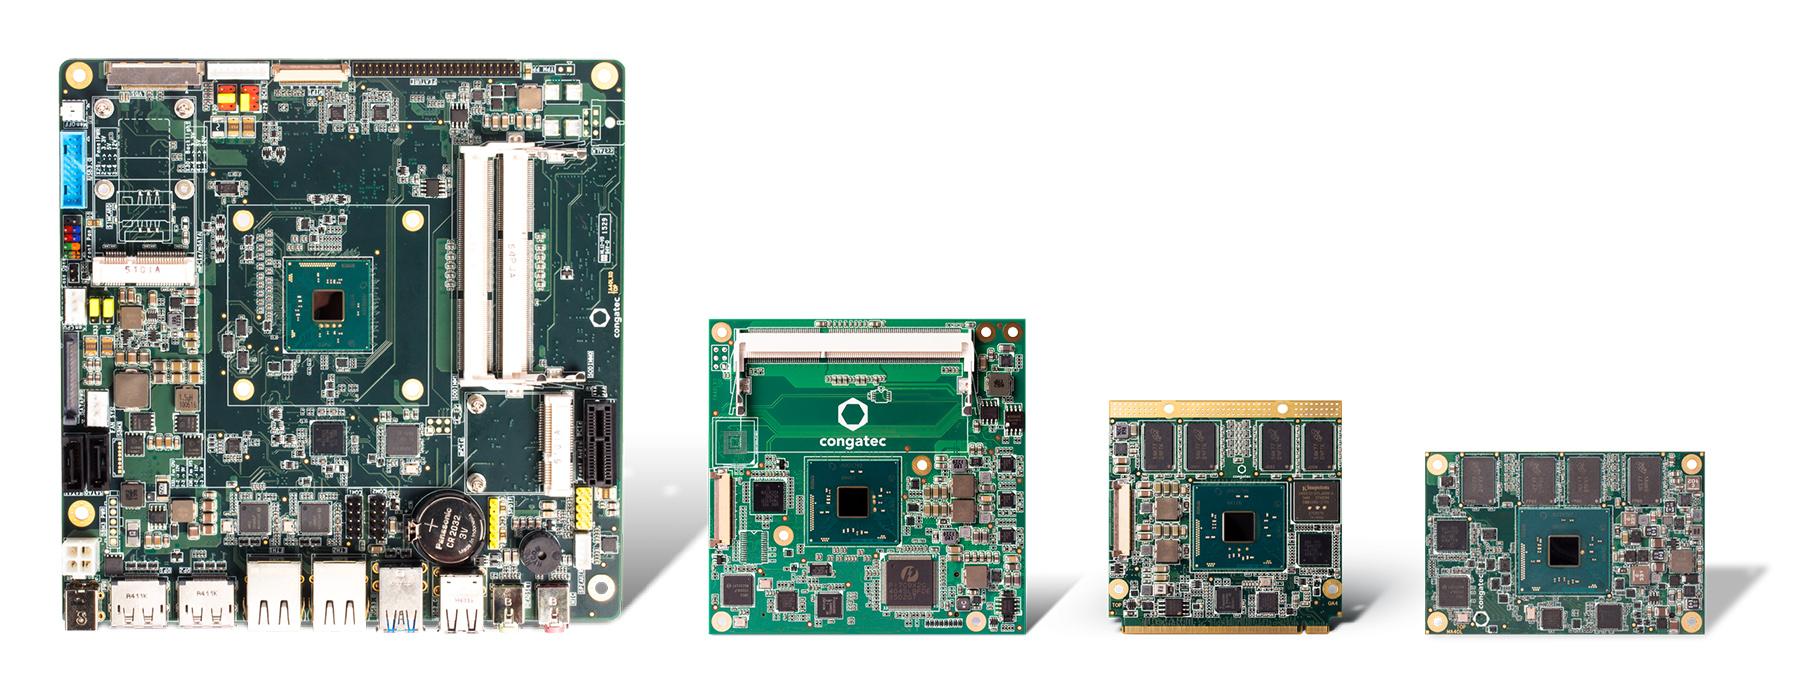 congatec XA4 product family Intel Atom